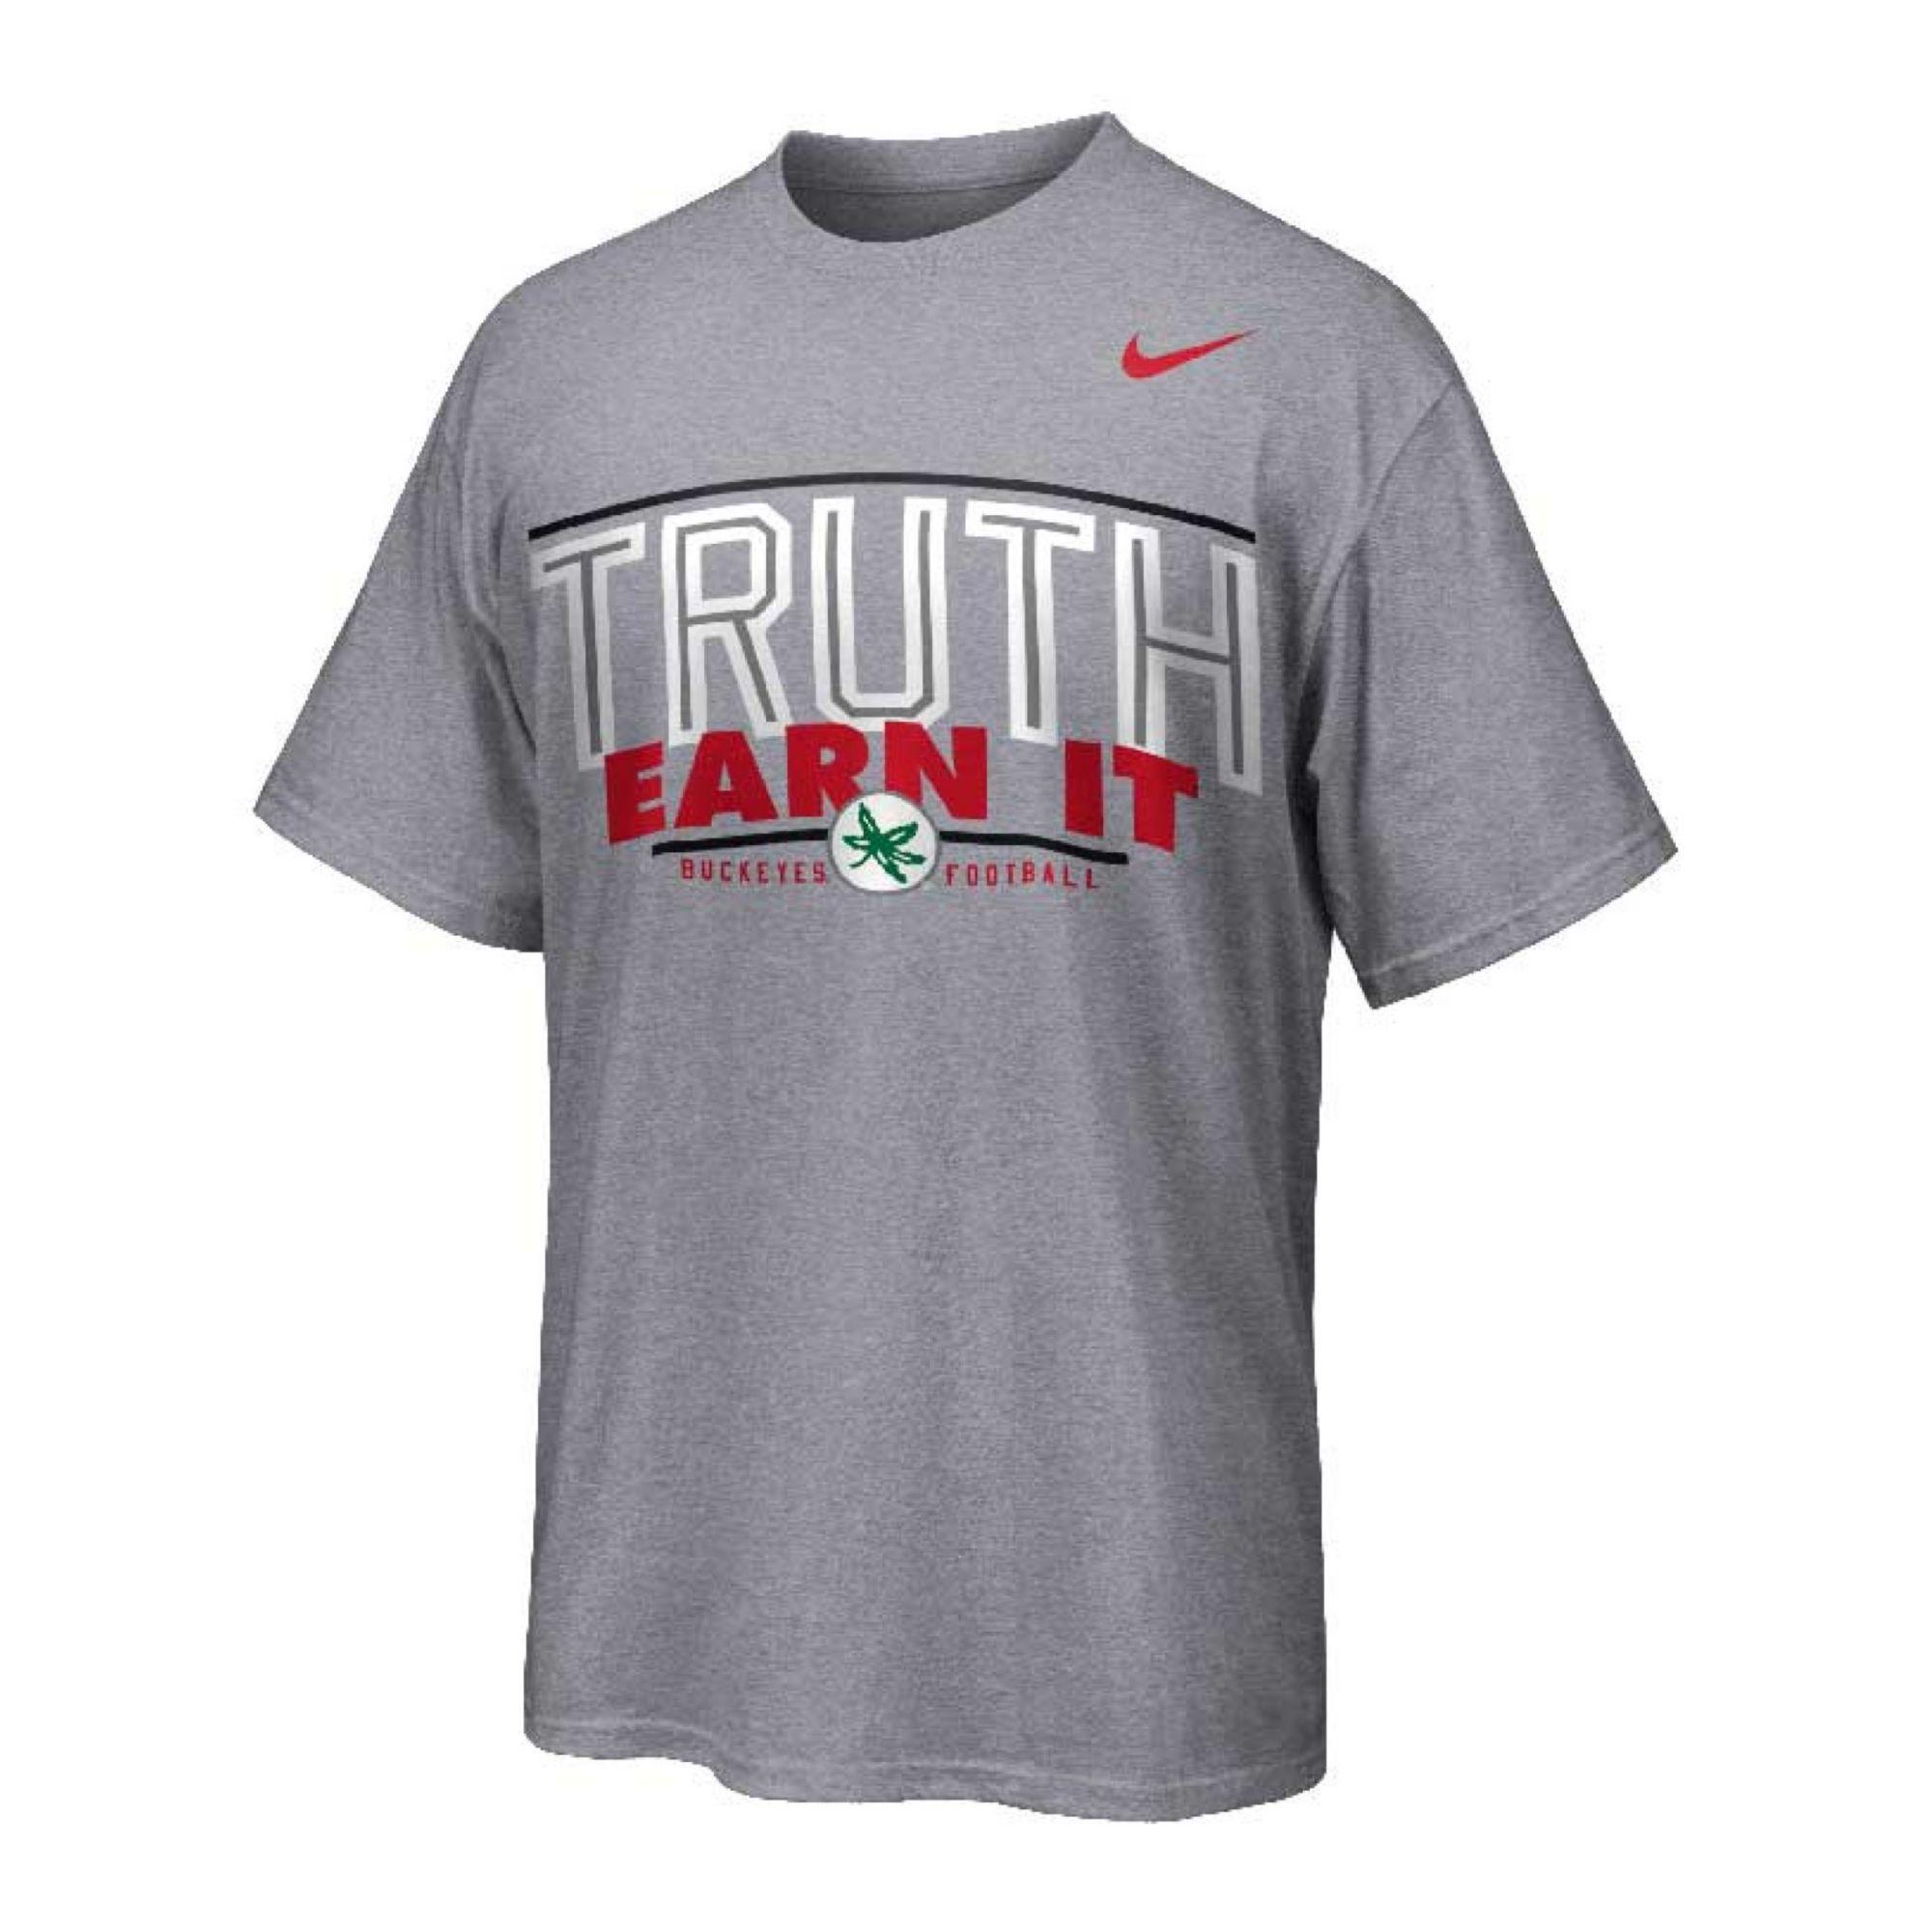 Ohio state nike shirts lera sweater for Ohio state t shirts